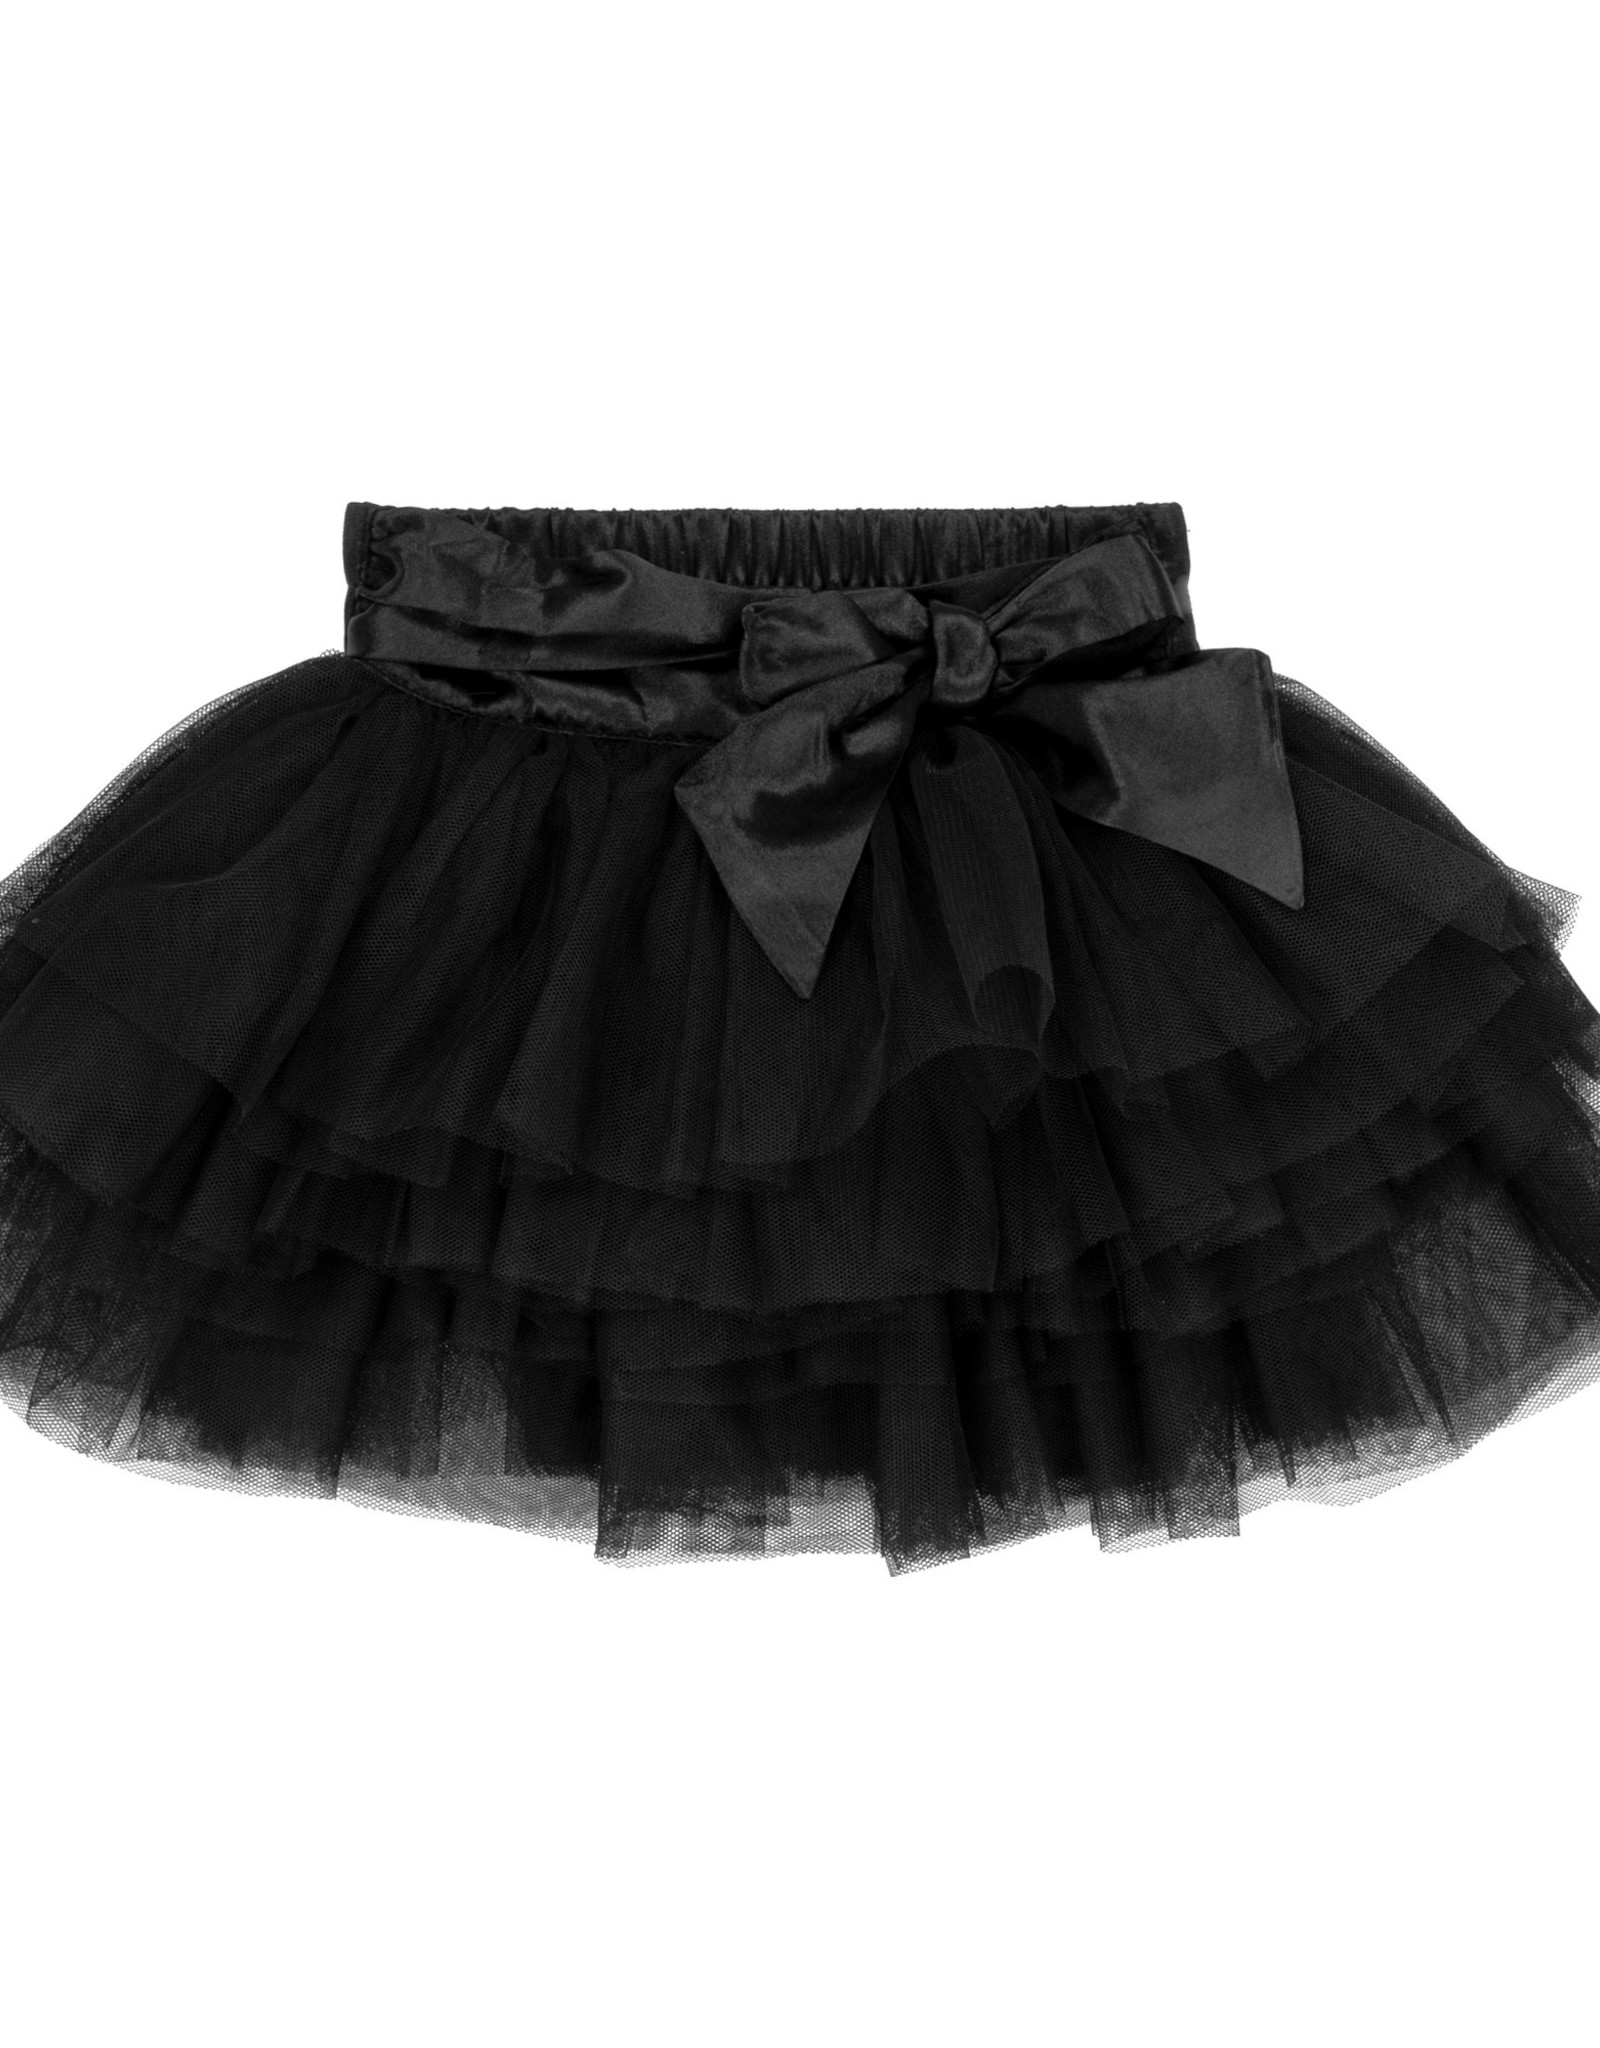 DeuxParDeux FA20 Bby Black Tulle Skirt